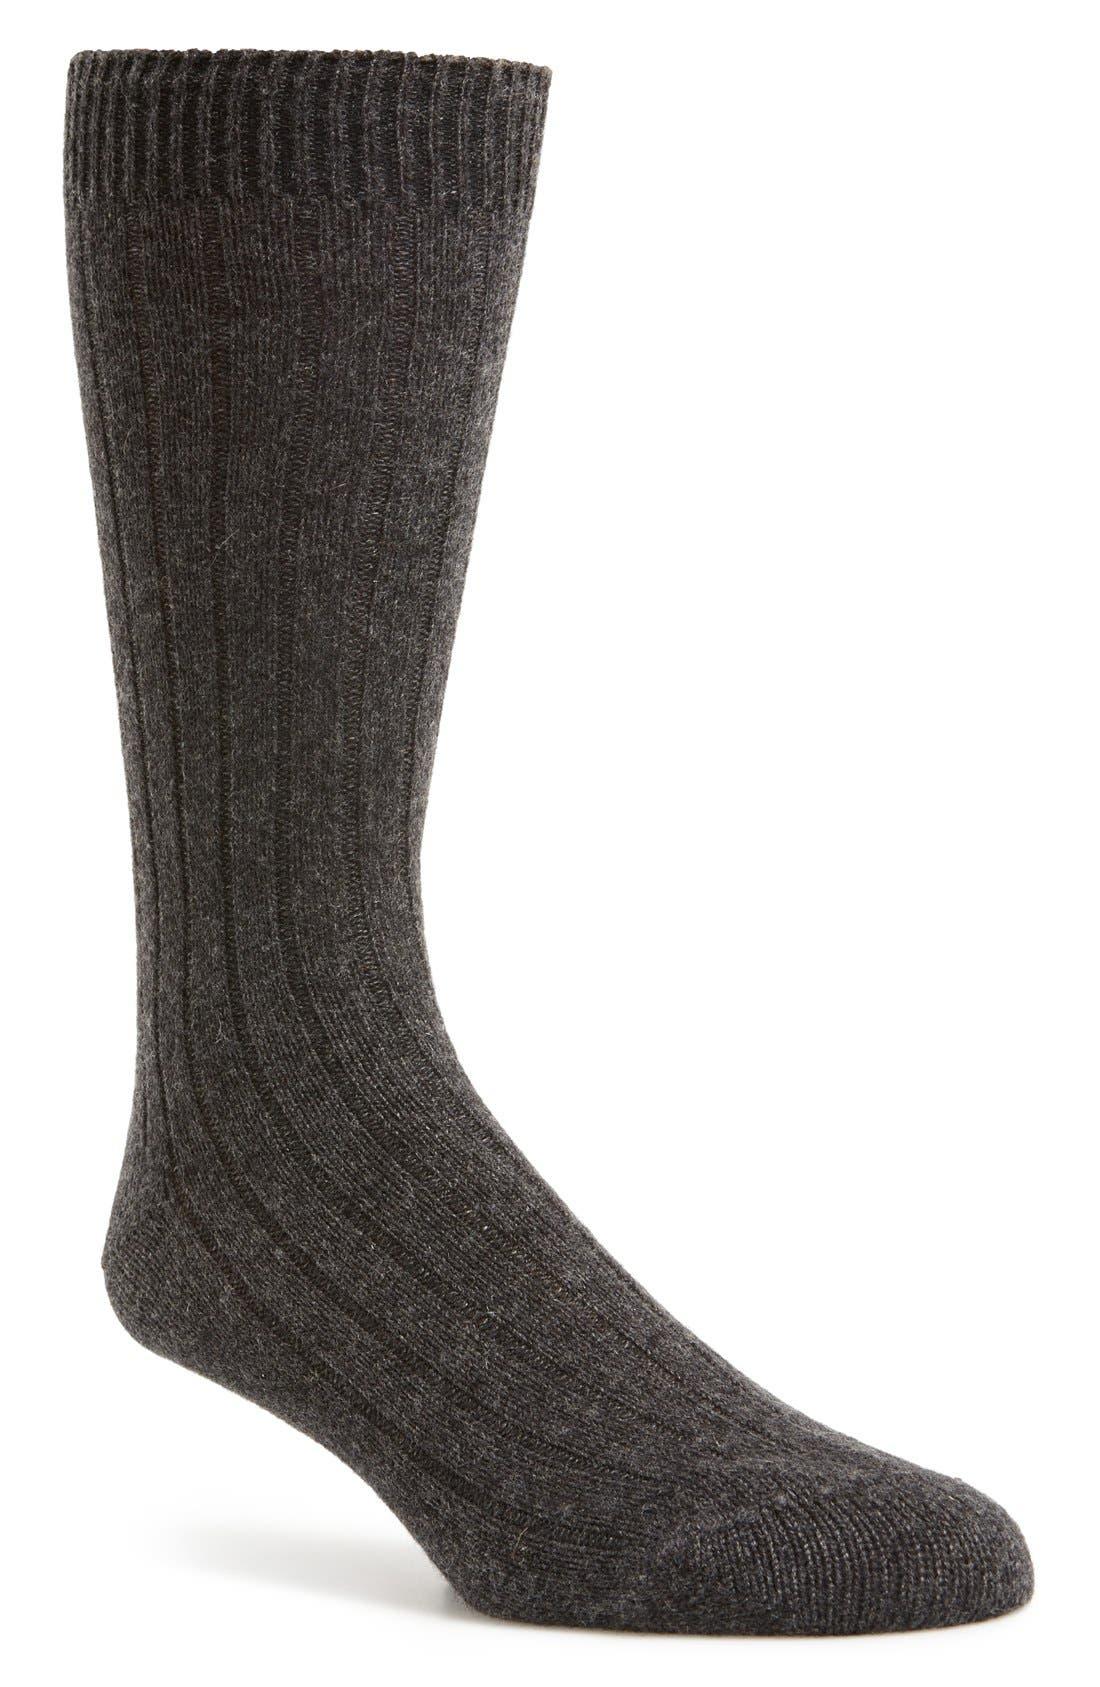 Alternate Image 1 Selected - Pantherella 'Waddington' Cashmere Blend Mid Calf Socks